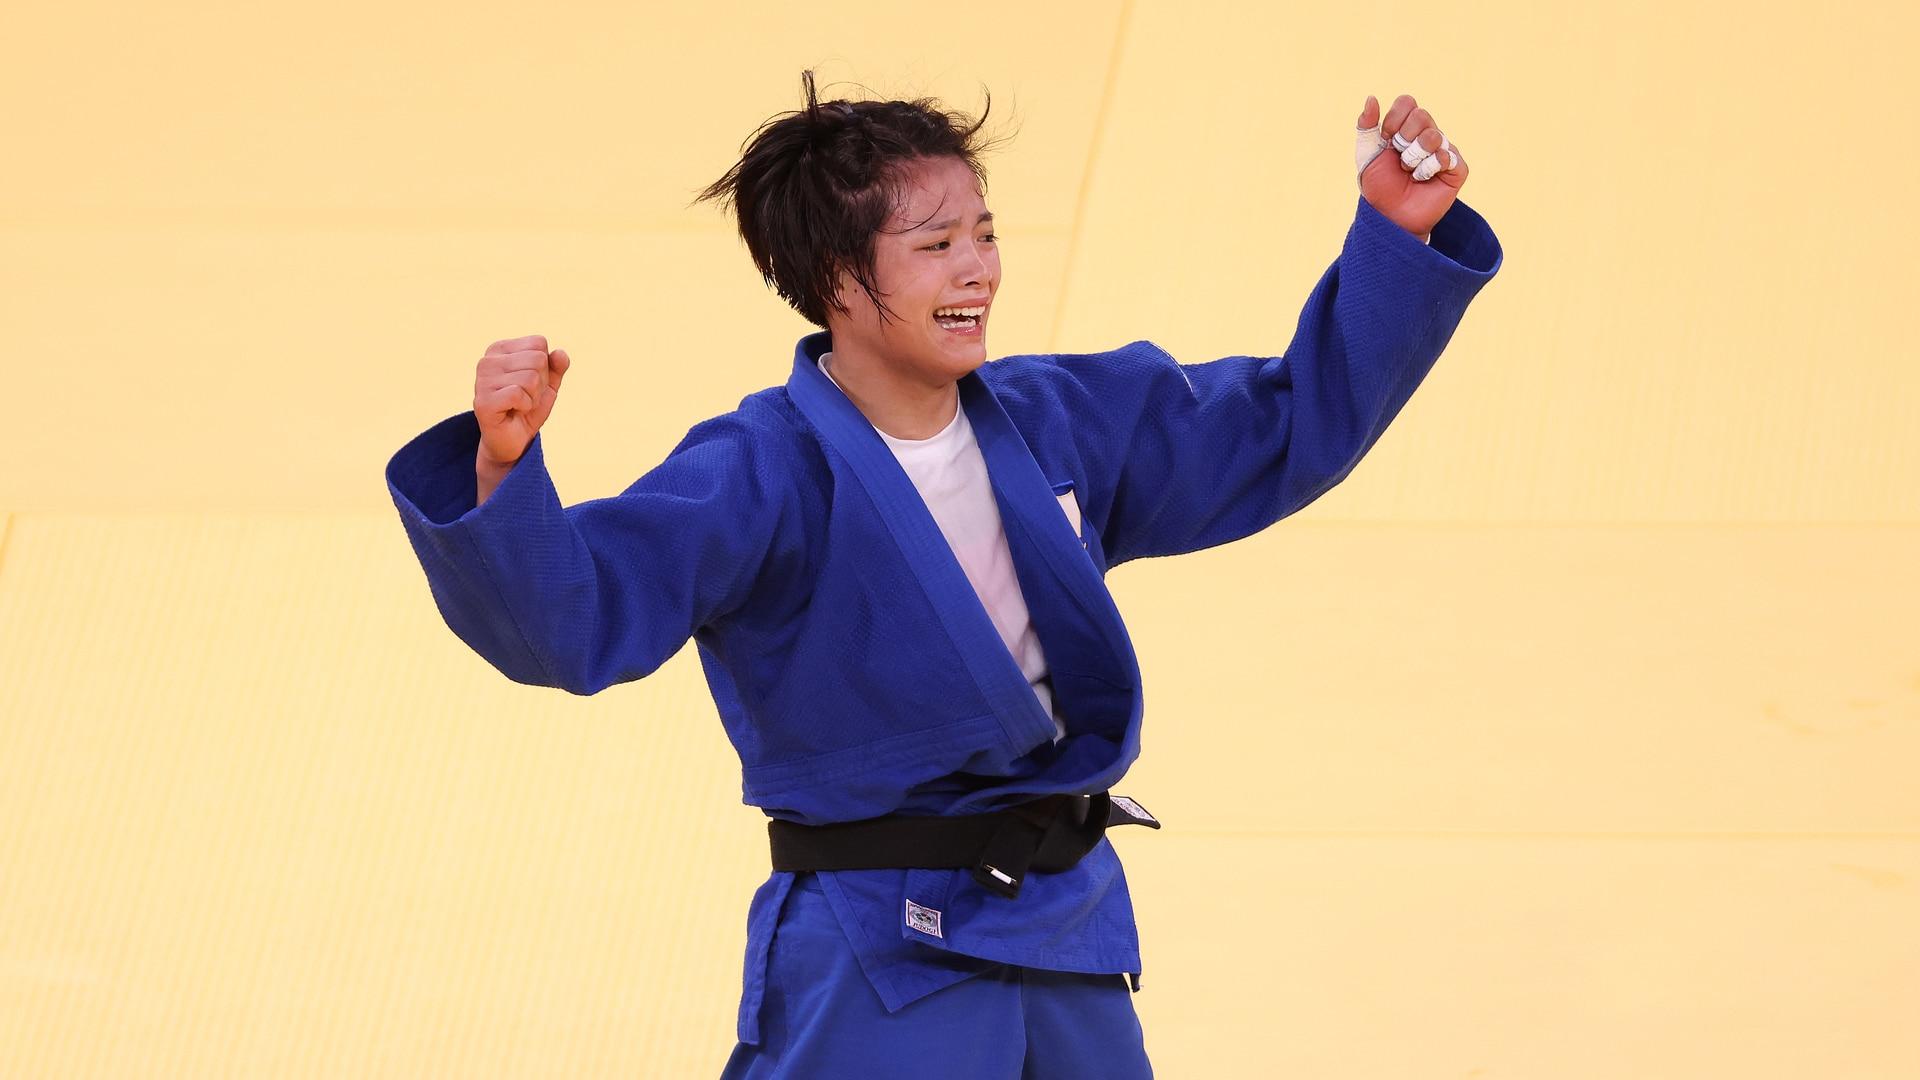 Siblings Abe Uta and Abe Hifuma become first siblings to win gold at same Olympics